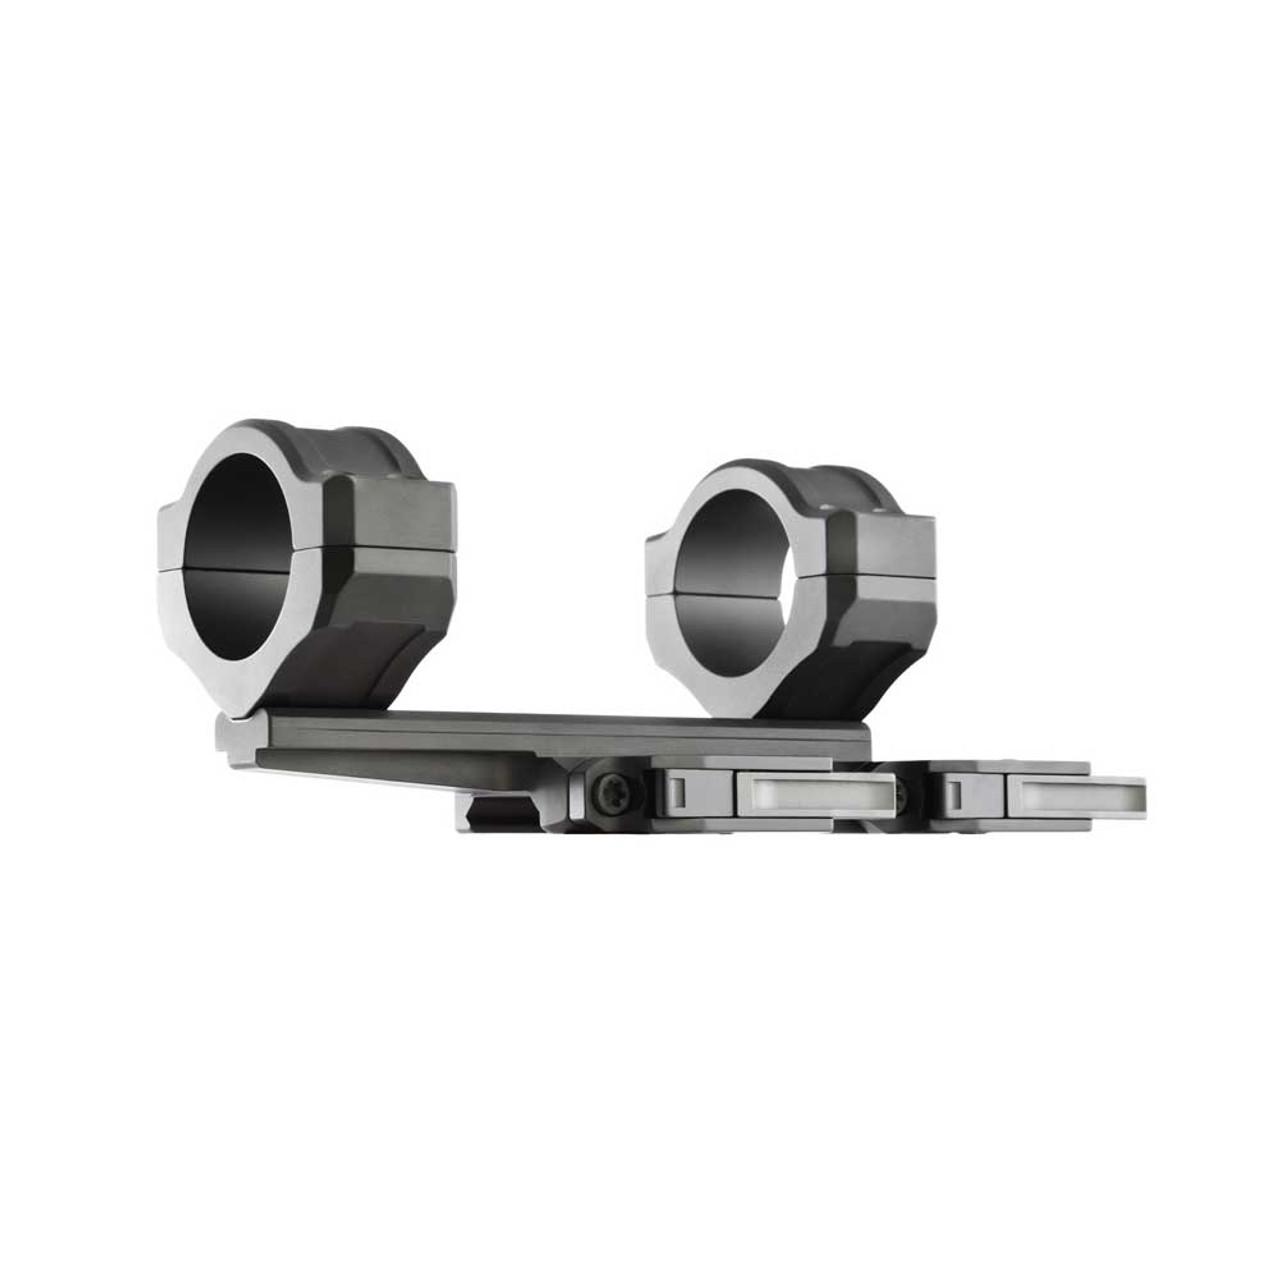 BOBRO ENGINEERING Dual Lever Precision Optic Mount 34mm Rings (B10-300-340)